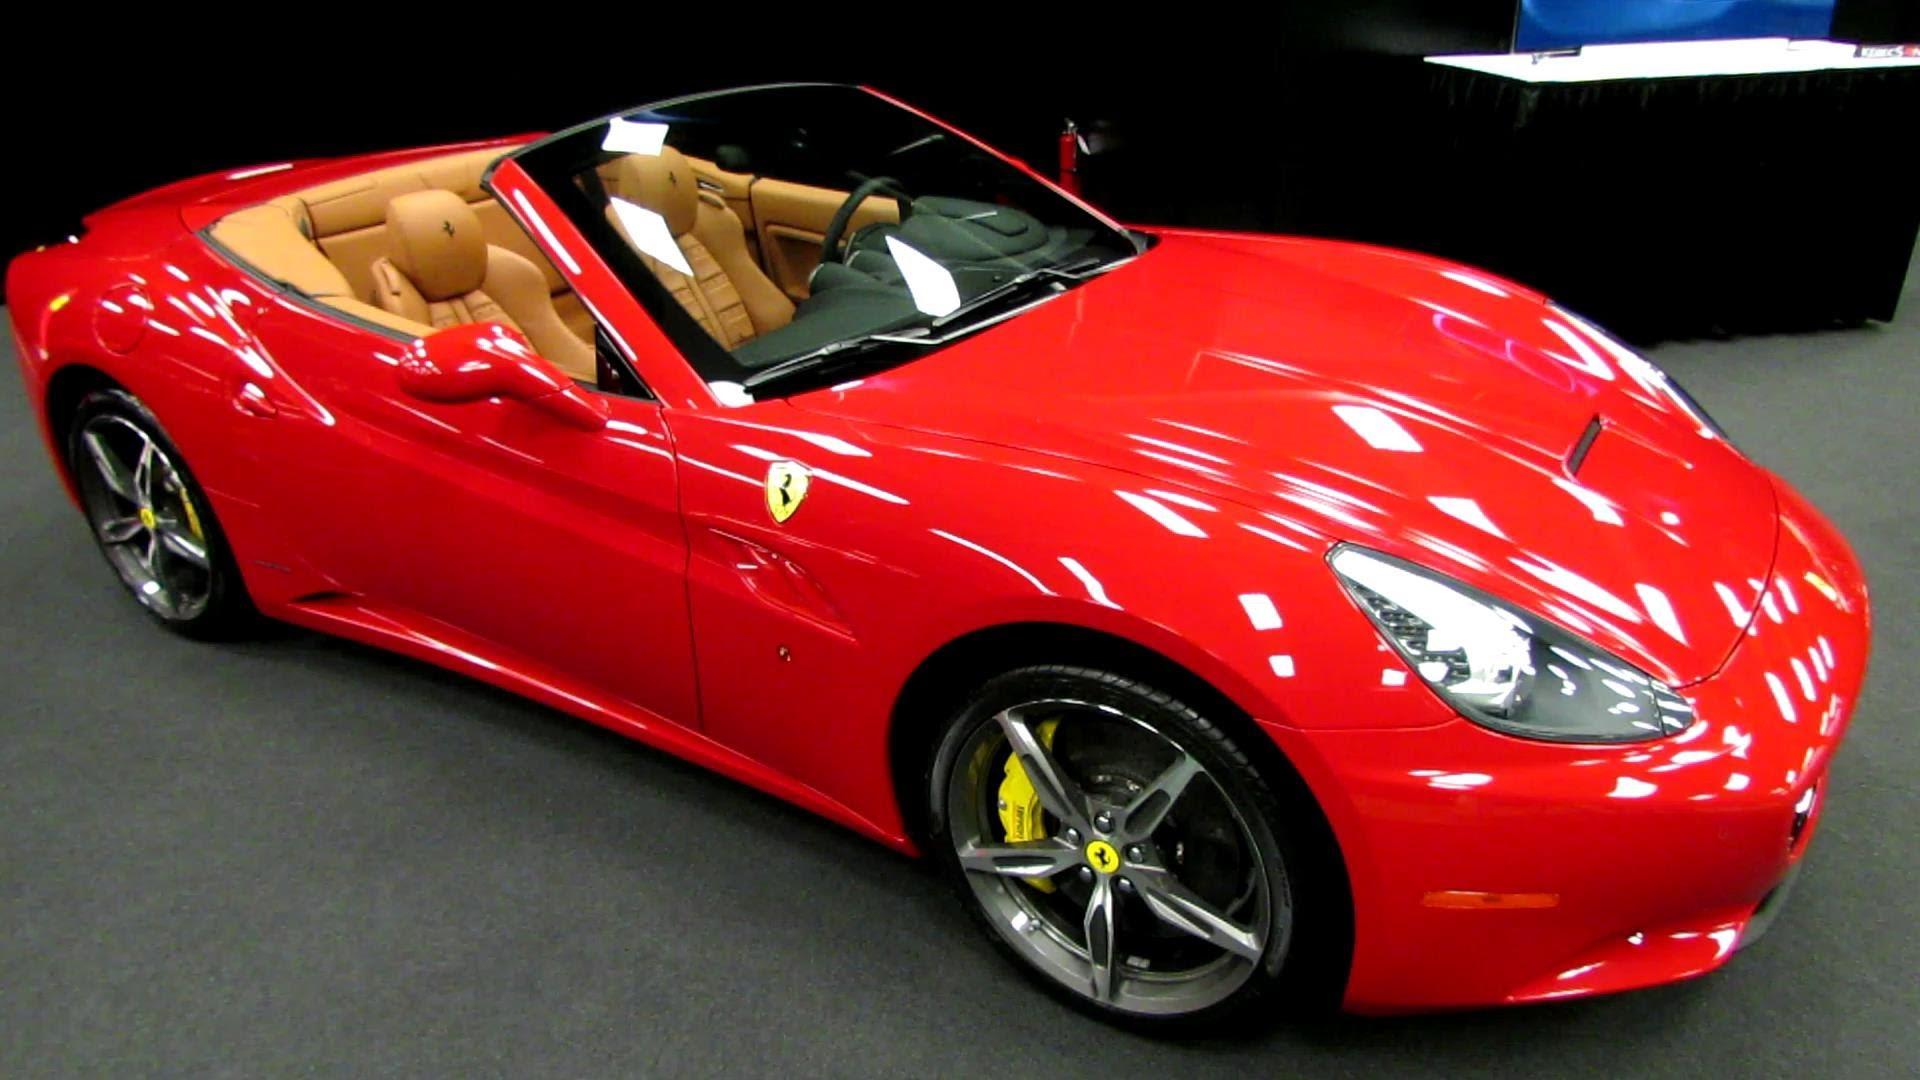 Ferrari California Wallpapers Vehicles Hq Ferrari California Pictures 4k Wallpapers 2019